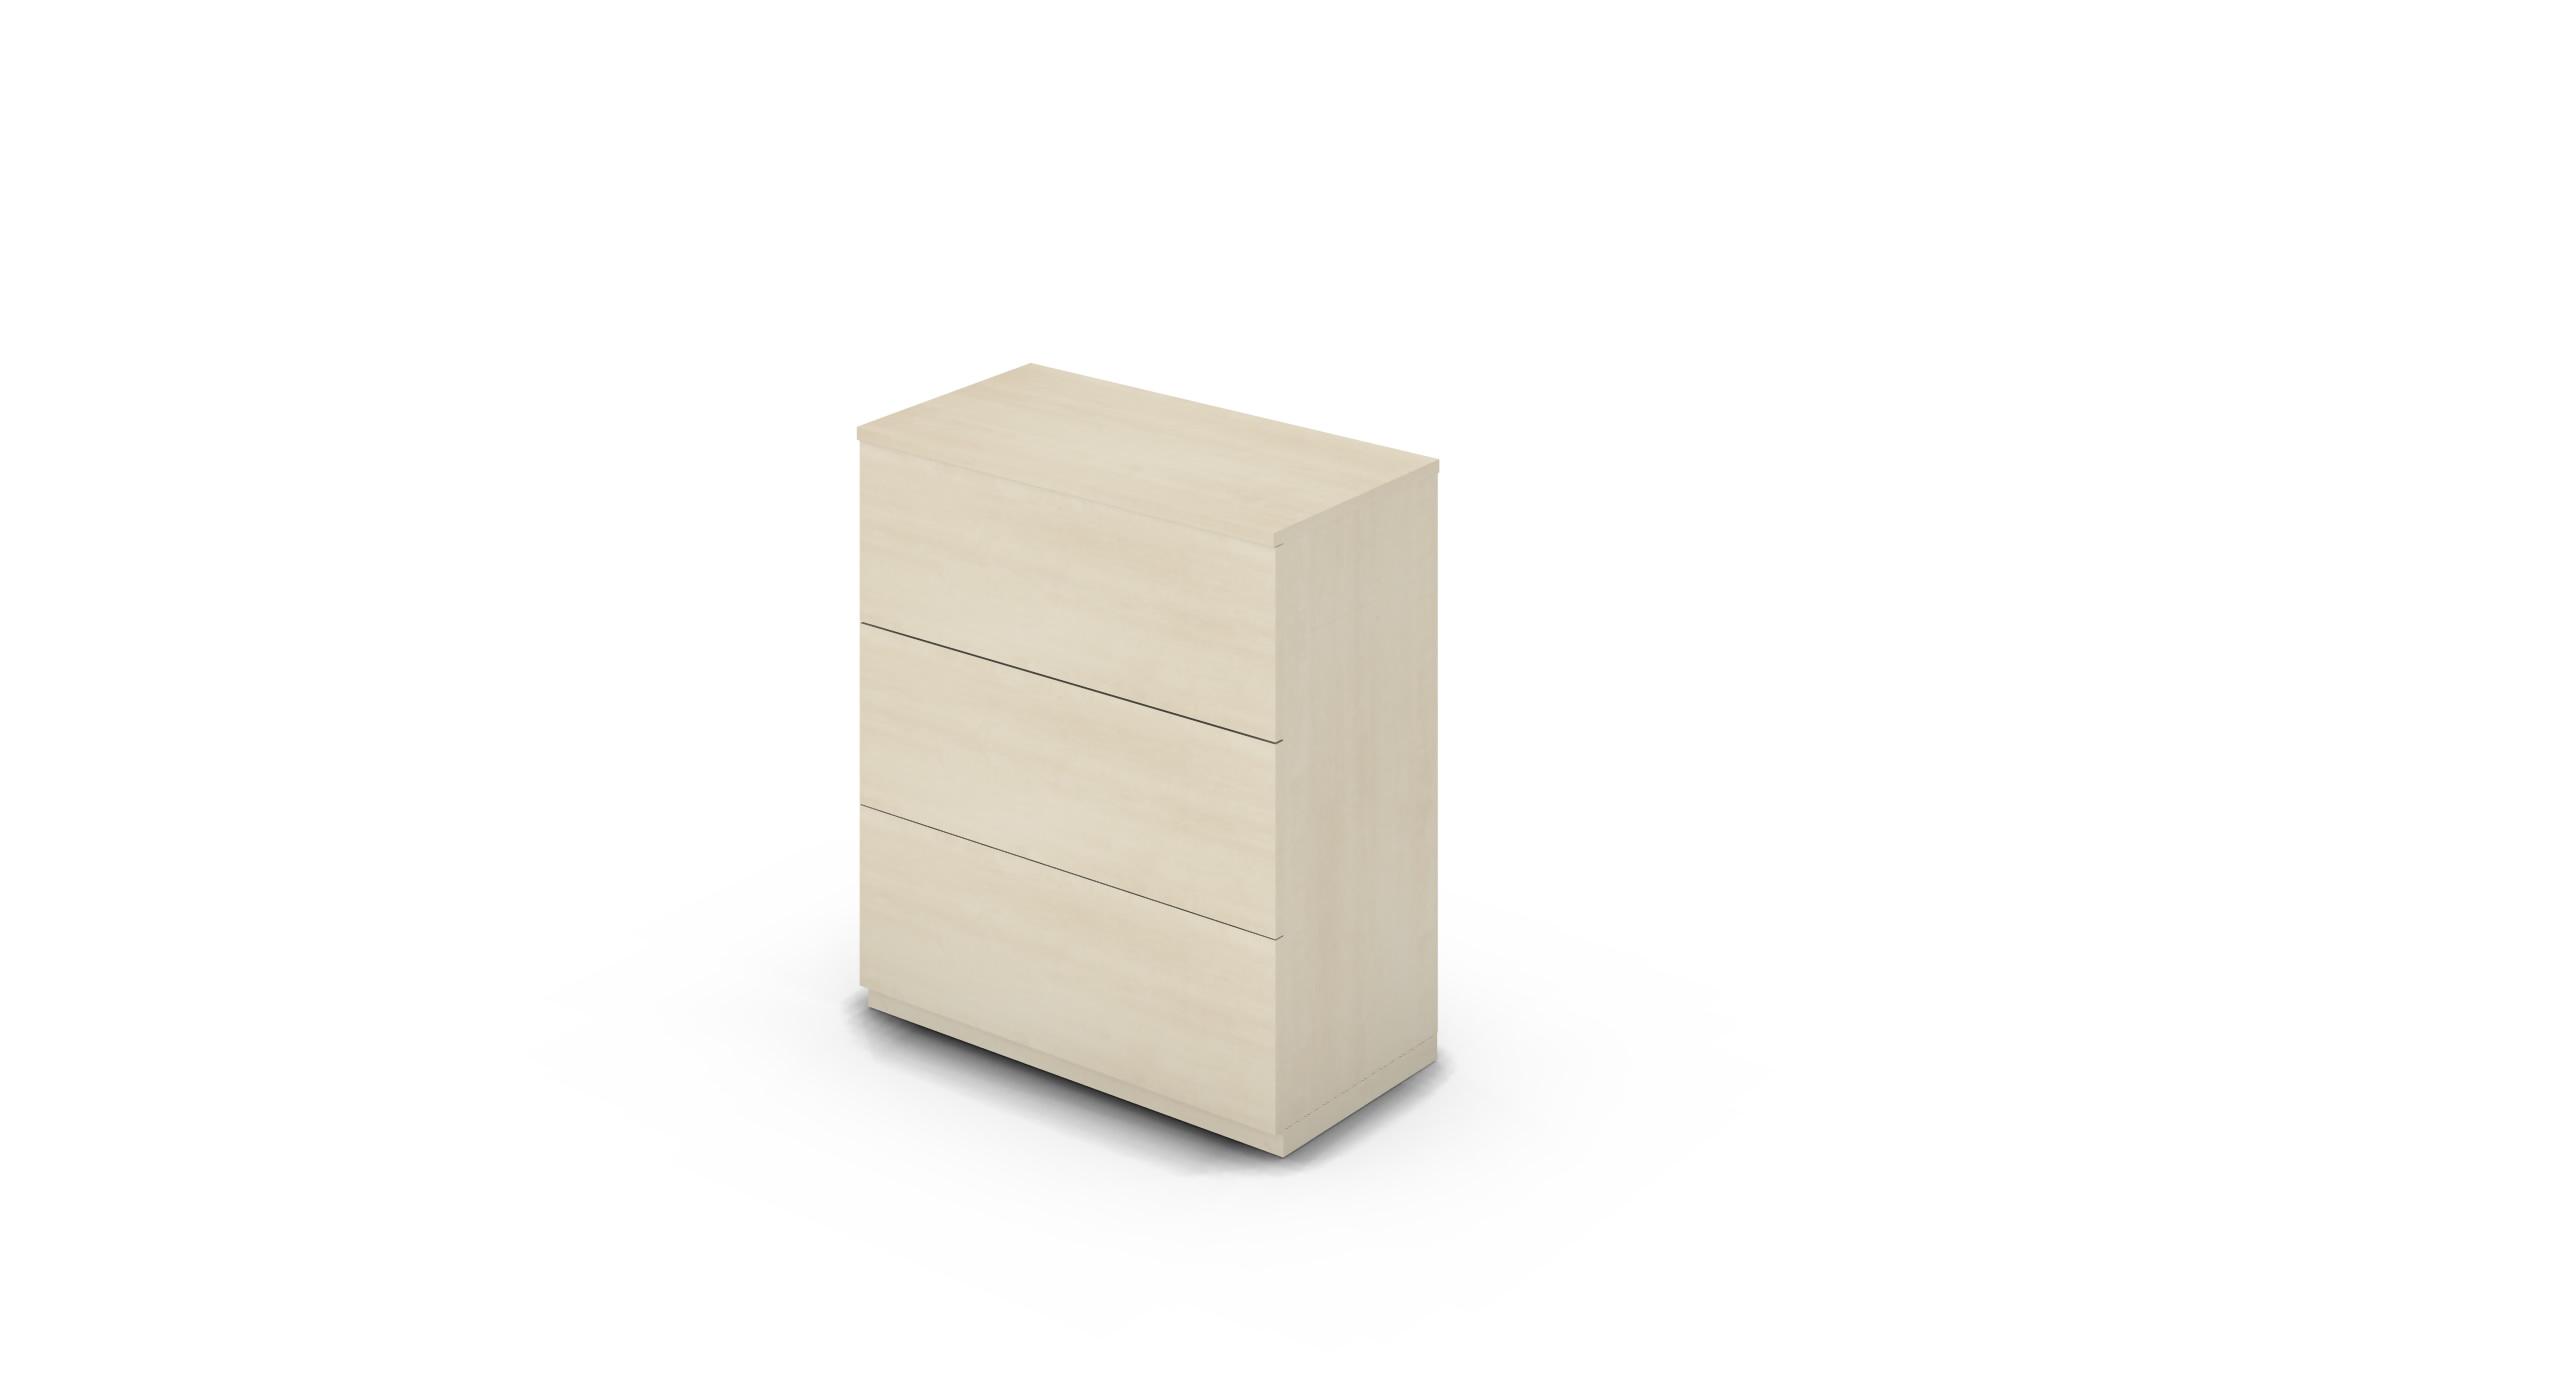 Cabinet_900x450x1125_DR_Maple_Push_NoCylinder